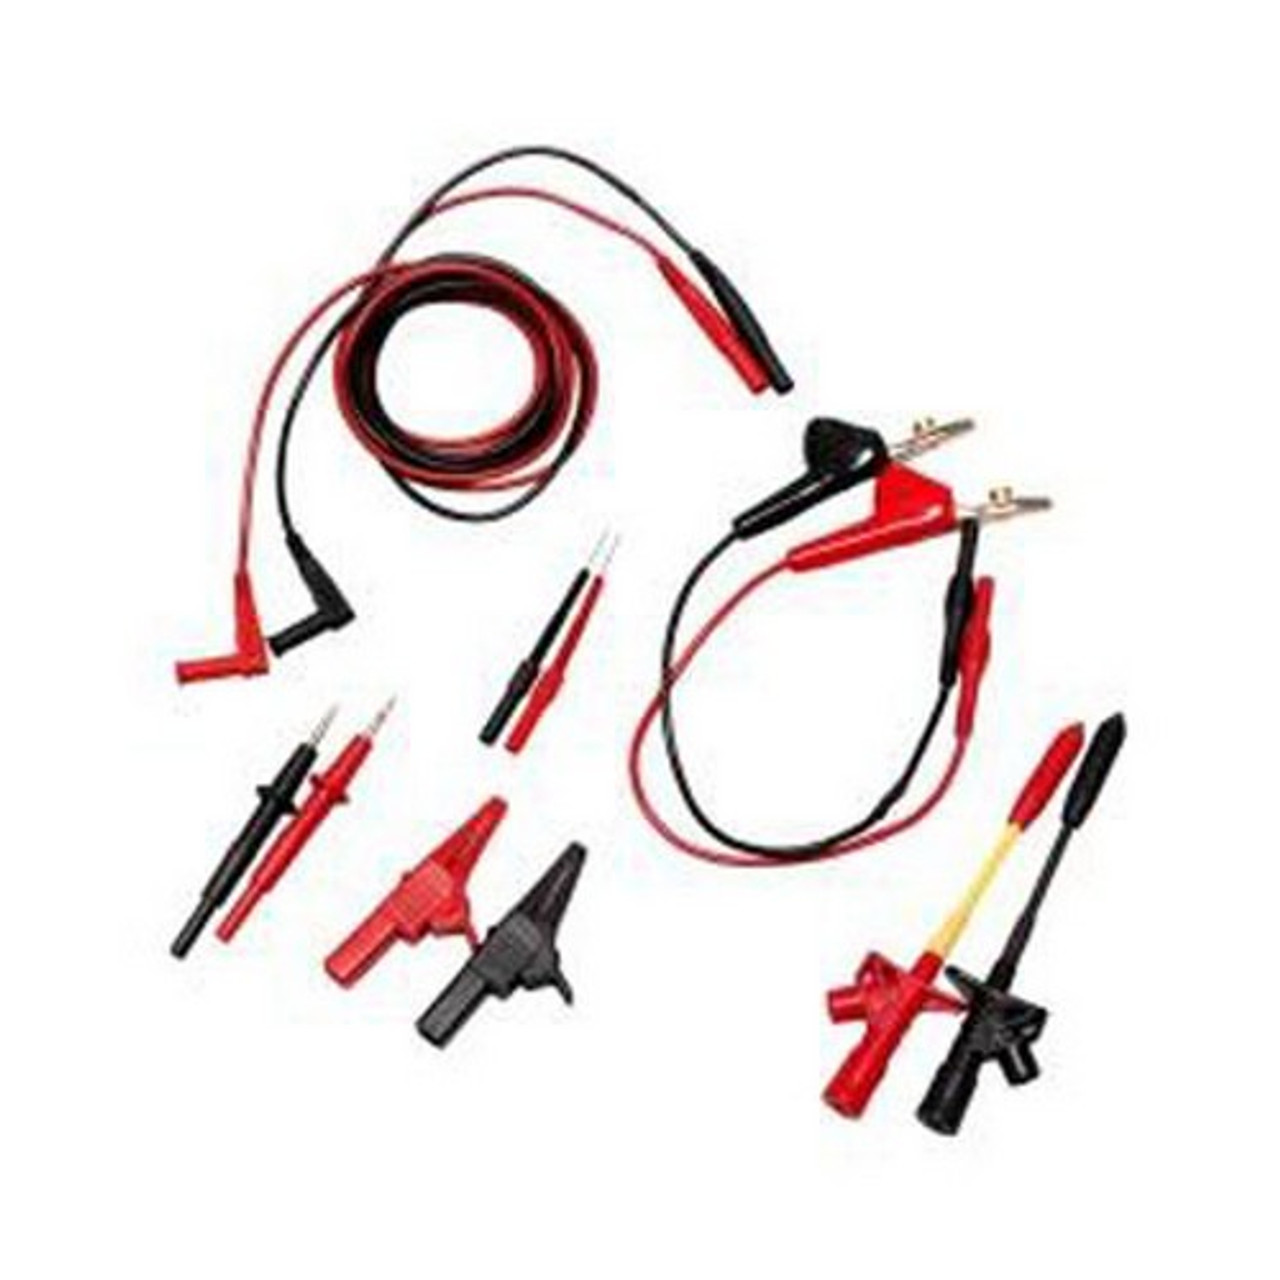 Electronic Specialties 142-5 Flexible Silicon Back Probe Pin